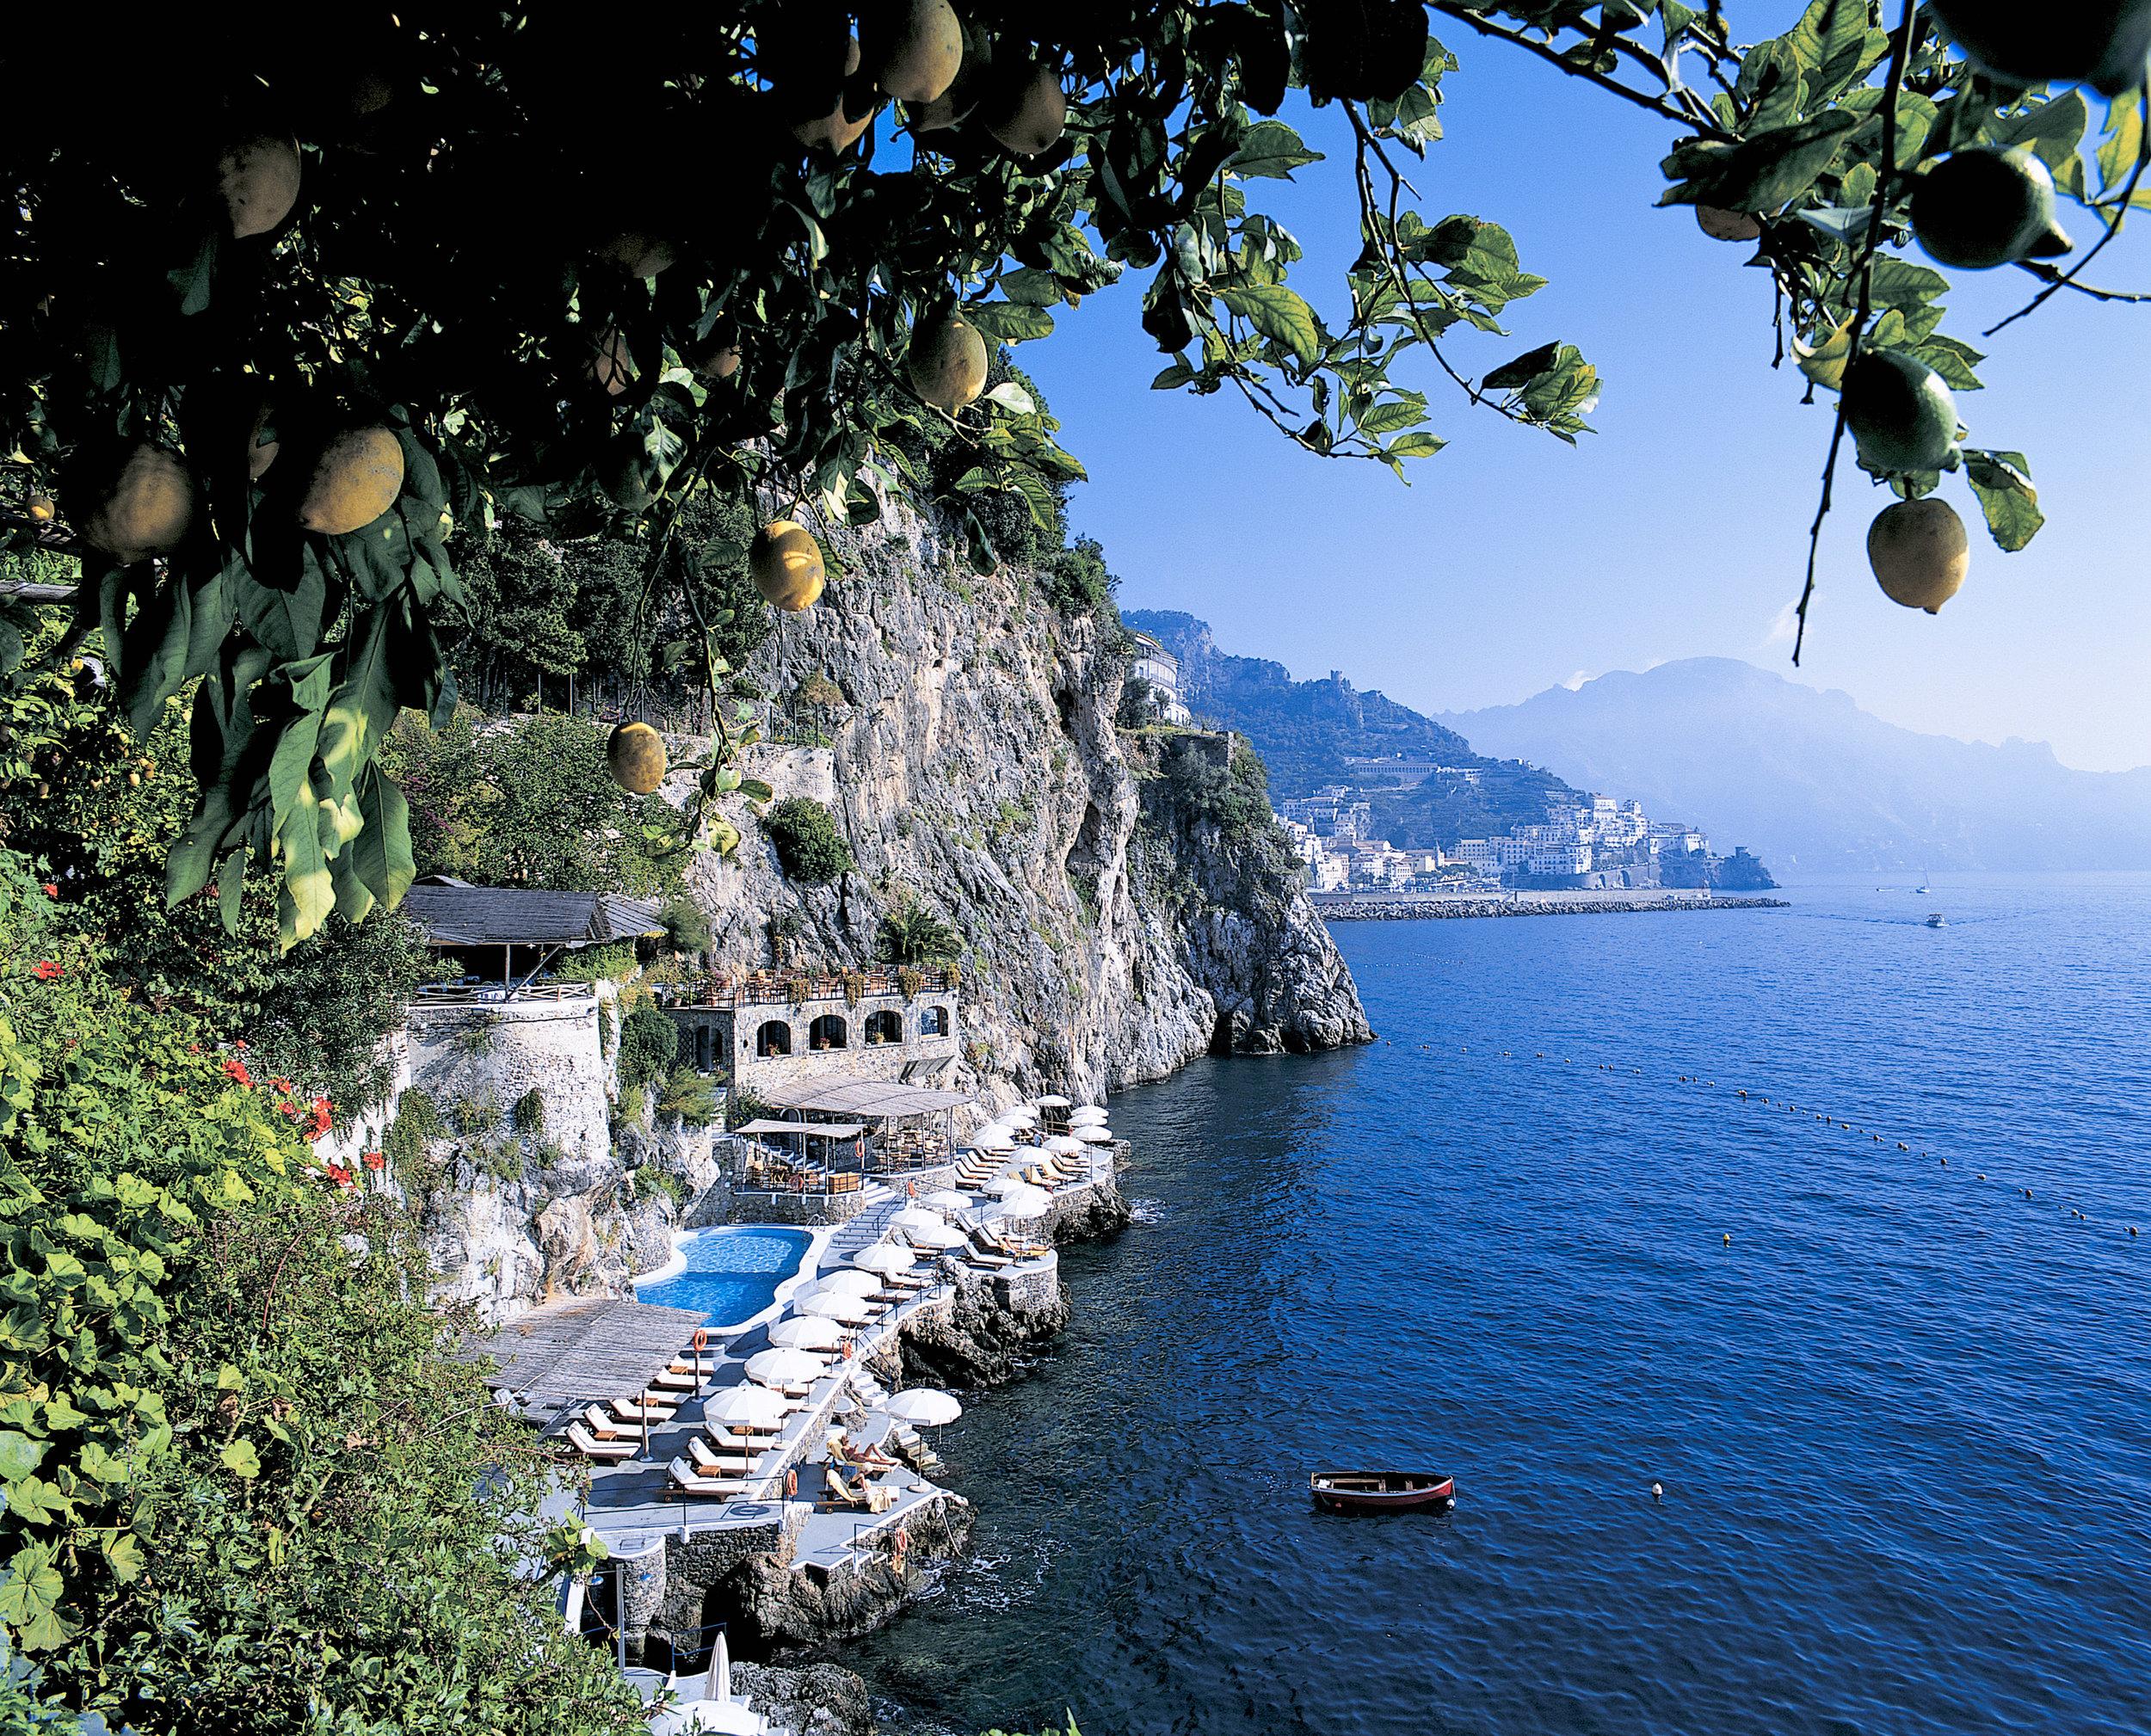 Santa Caterina - AMALFI COAST